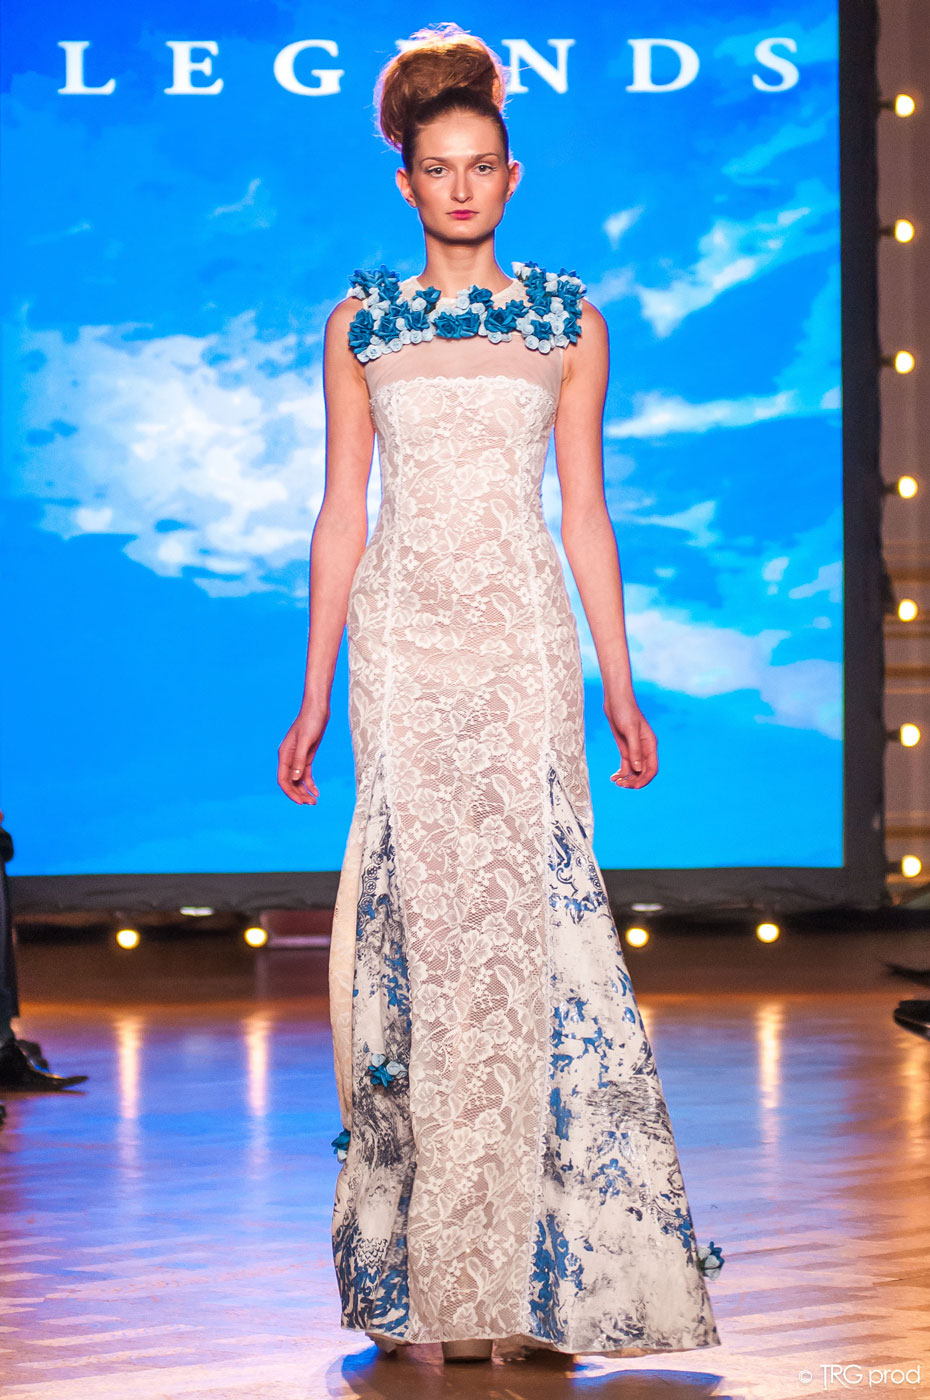 Legends-fashion-runway-show-haute-couture-paris-spring-2015-the-impression-05